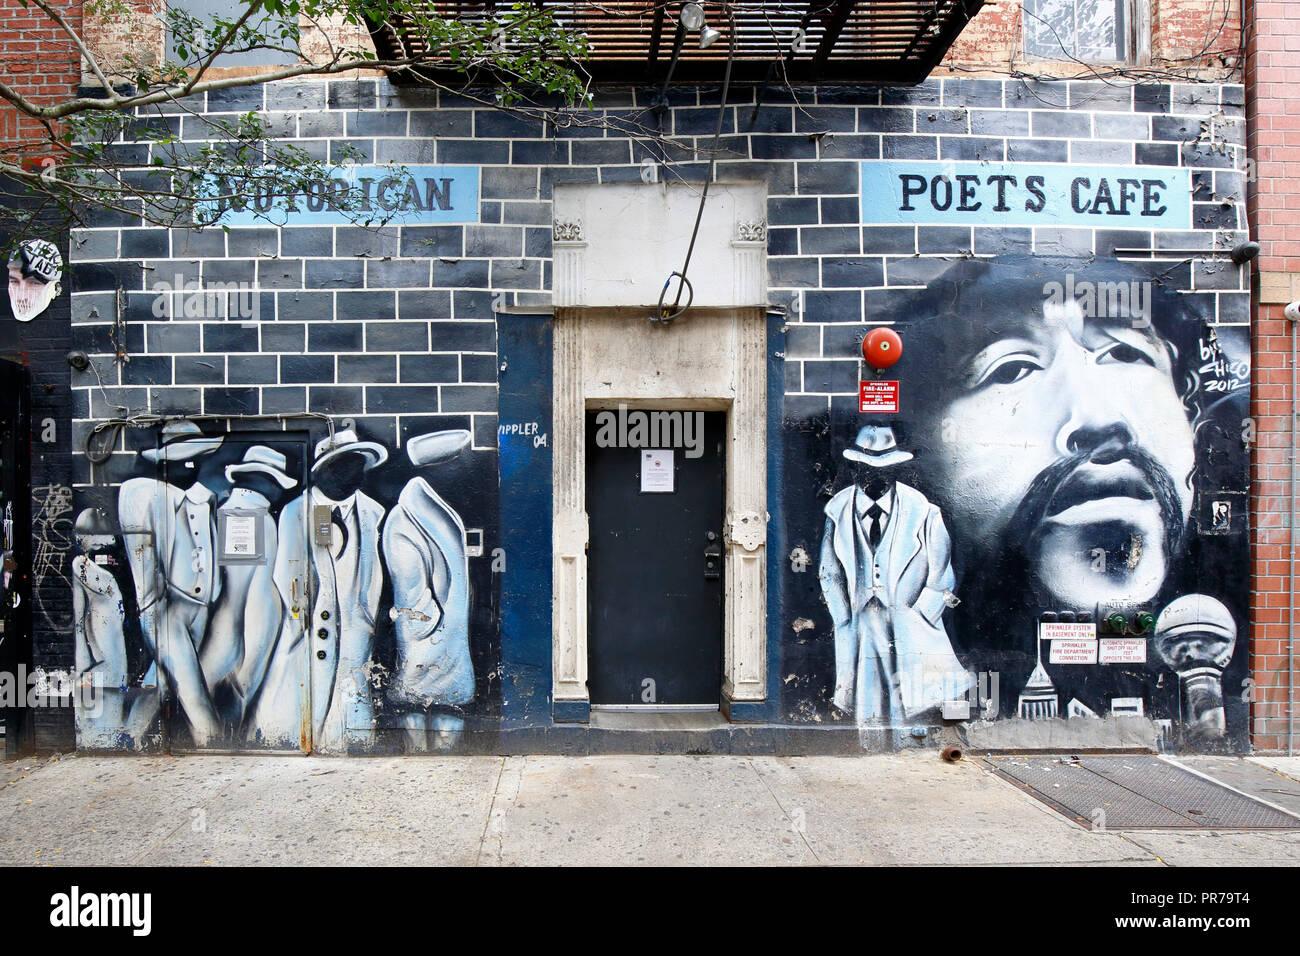 Nuyorican Poets Cafe, 236 E 3rd St, New York, NY - Stock Image